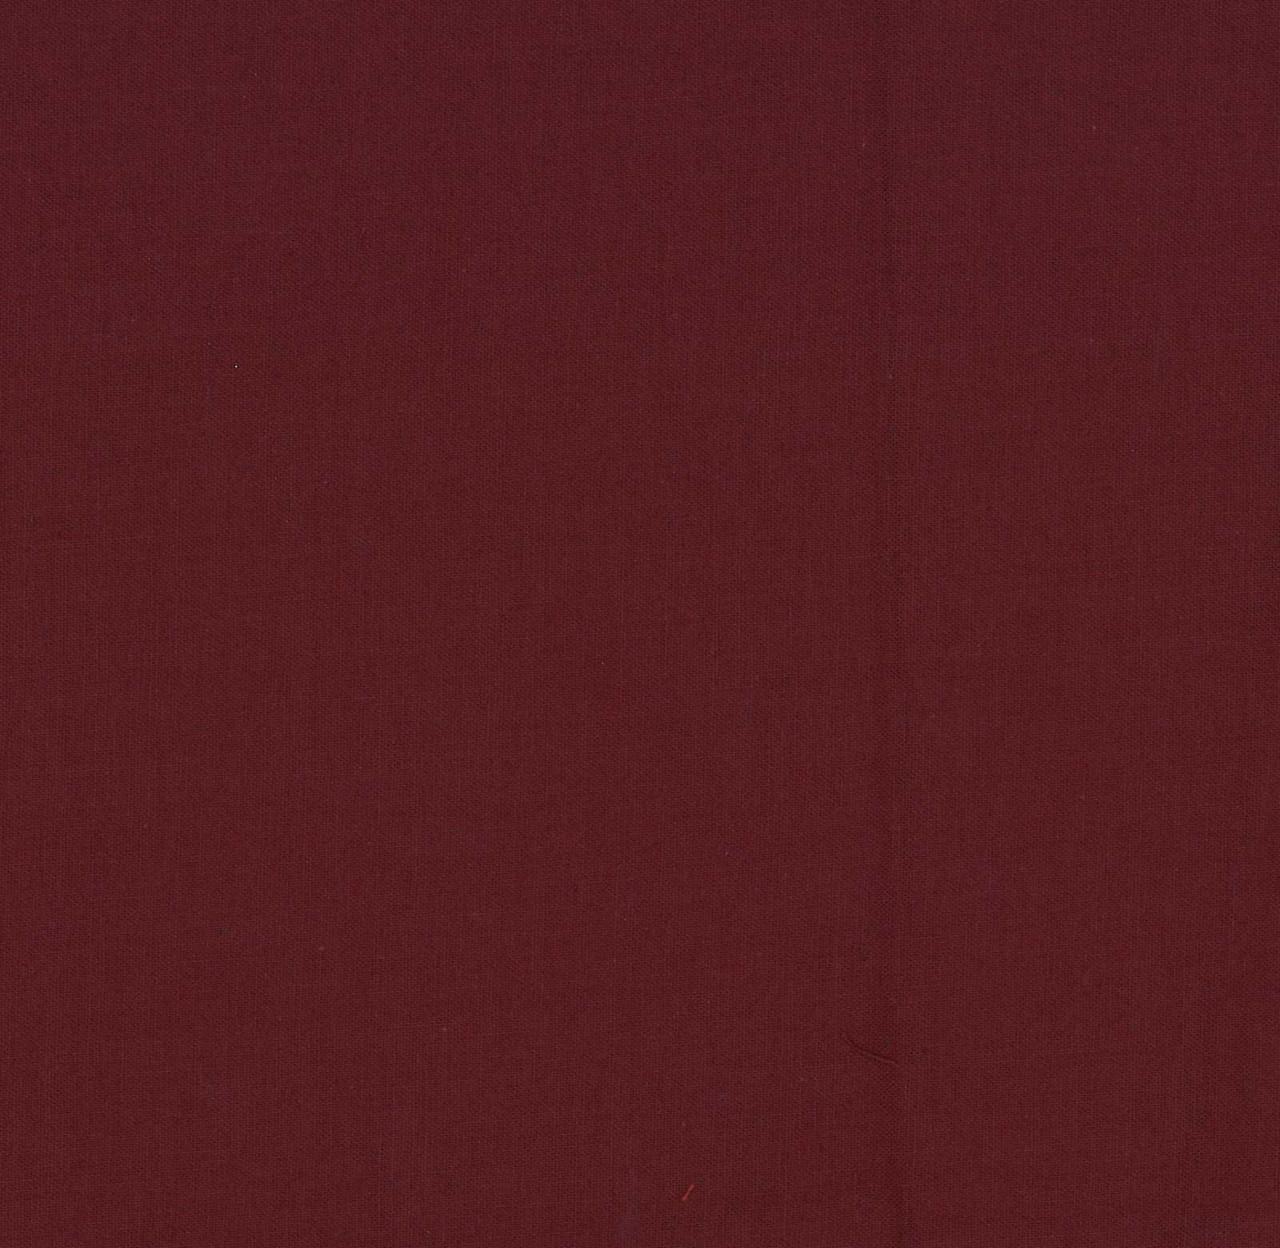 Garnet - Oasis Solids - Fabric - 100% Cotton 44/45″ wide 100% US Grown Cotton